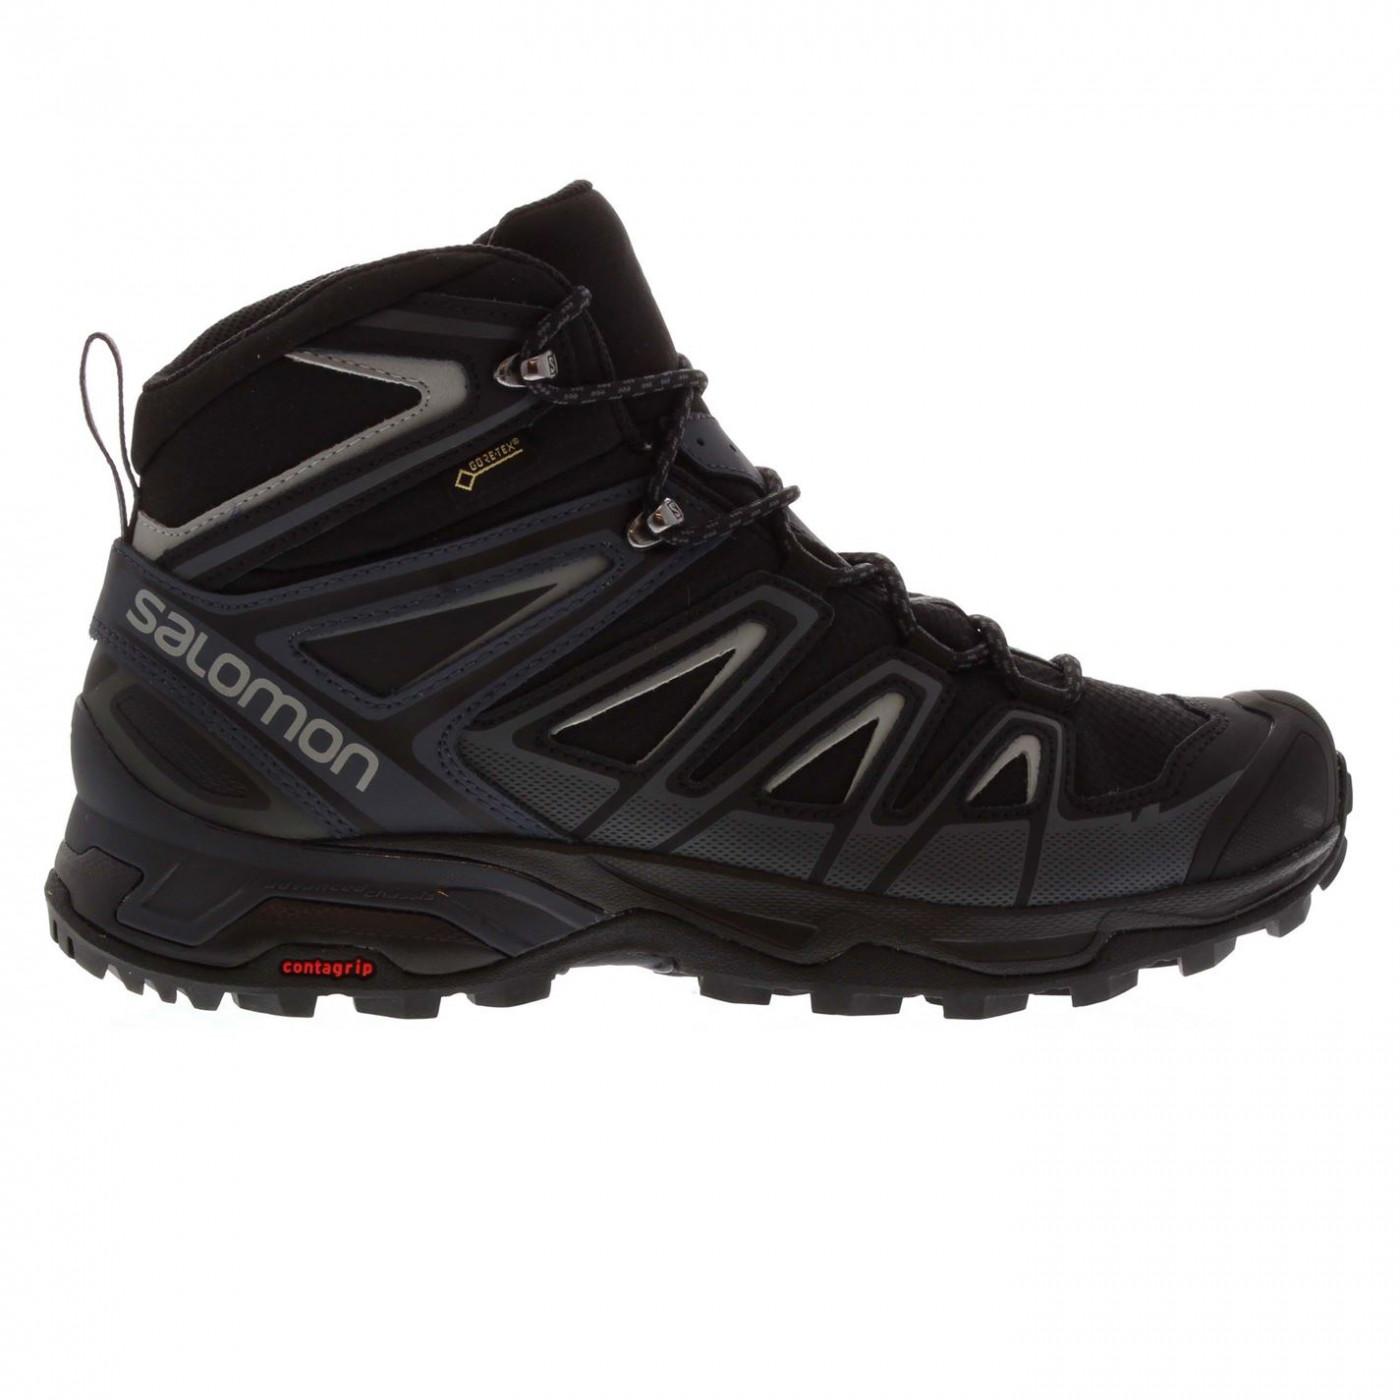 Salomon X Ultra 3 GTX Mid Mens Walking Shoes